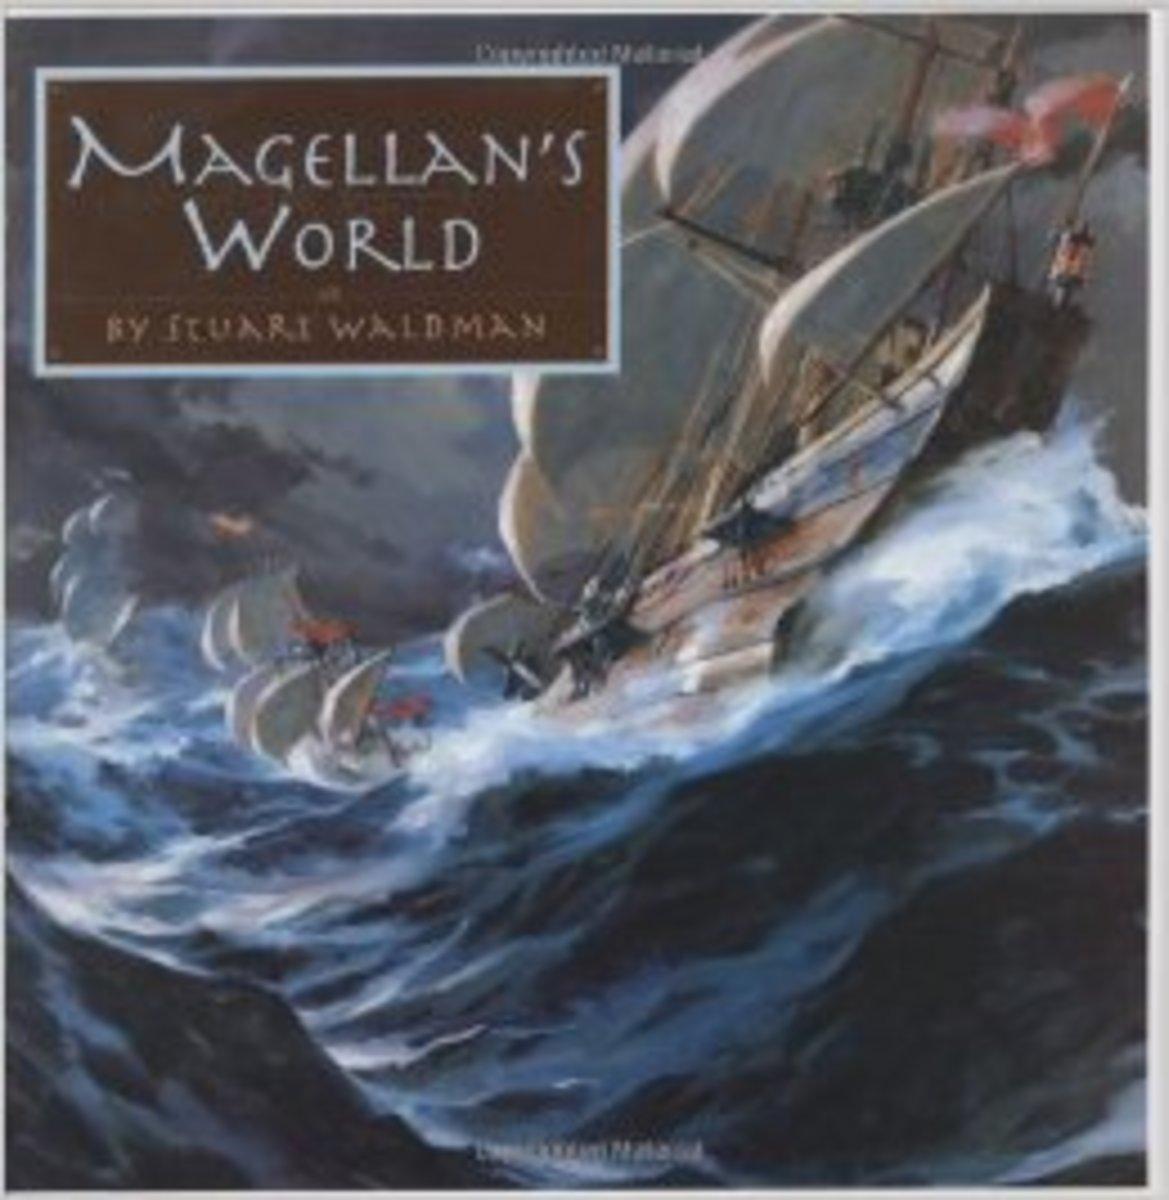 Magellan's World (Great Explorers) by Stuart Waldman